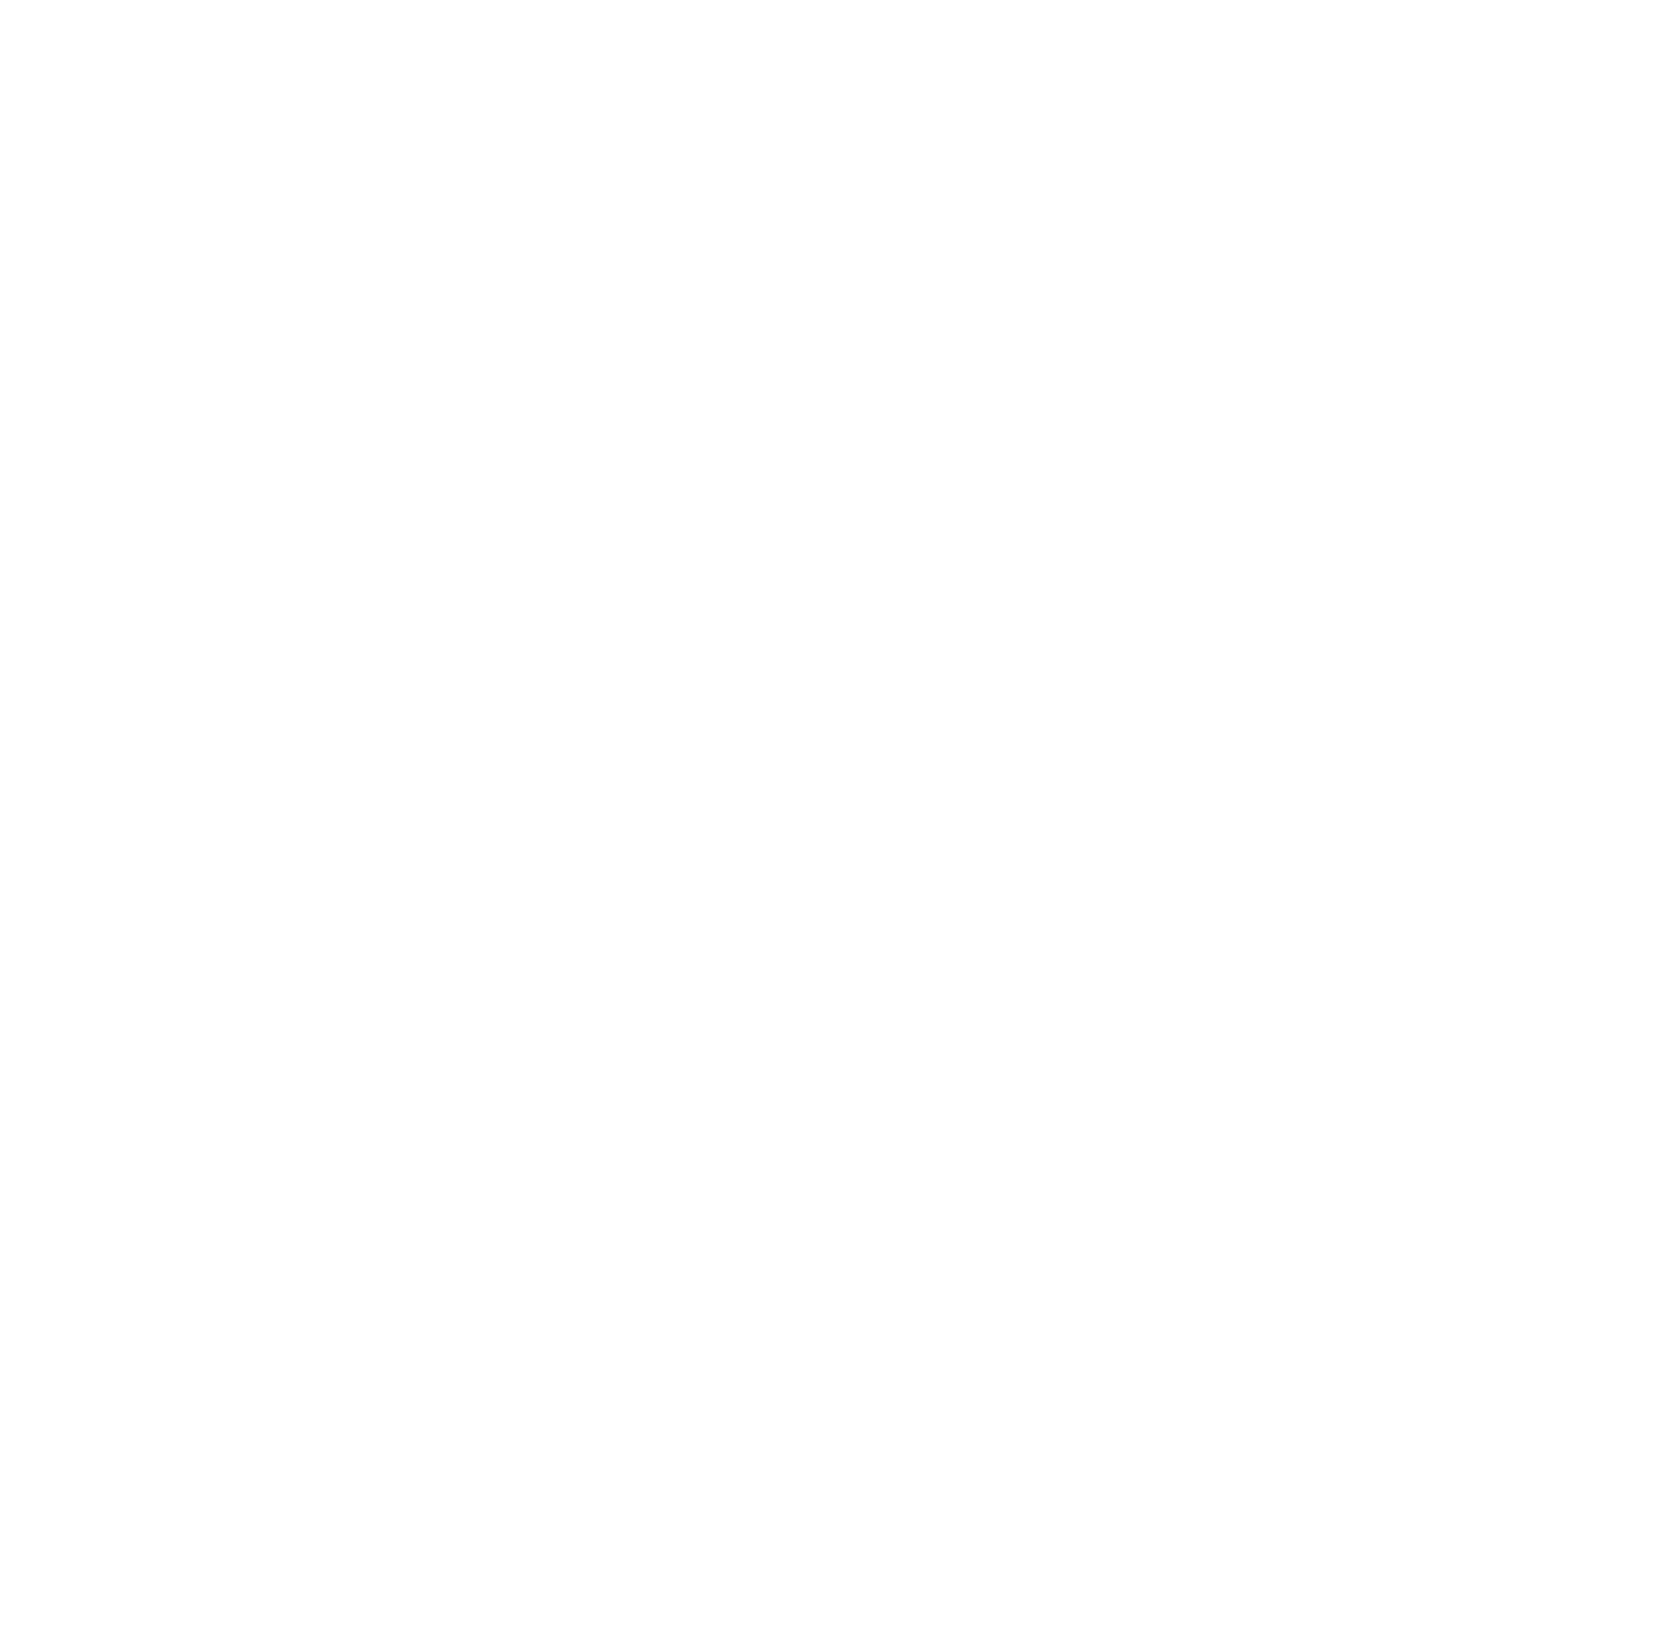 Homes for sale in Houston - Tim Sojka Team - See Tim Sell